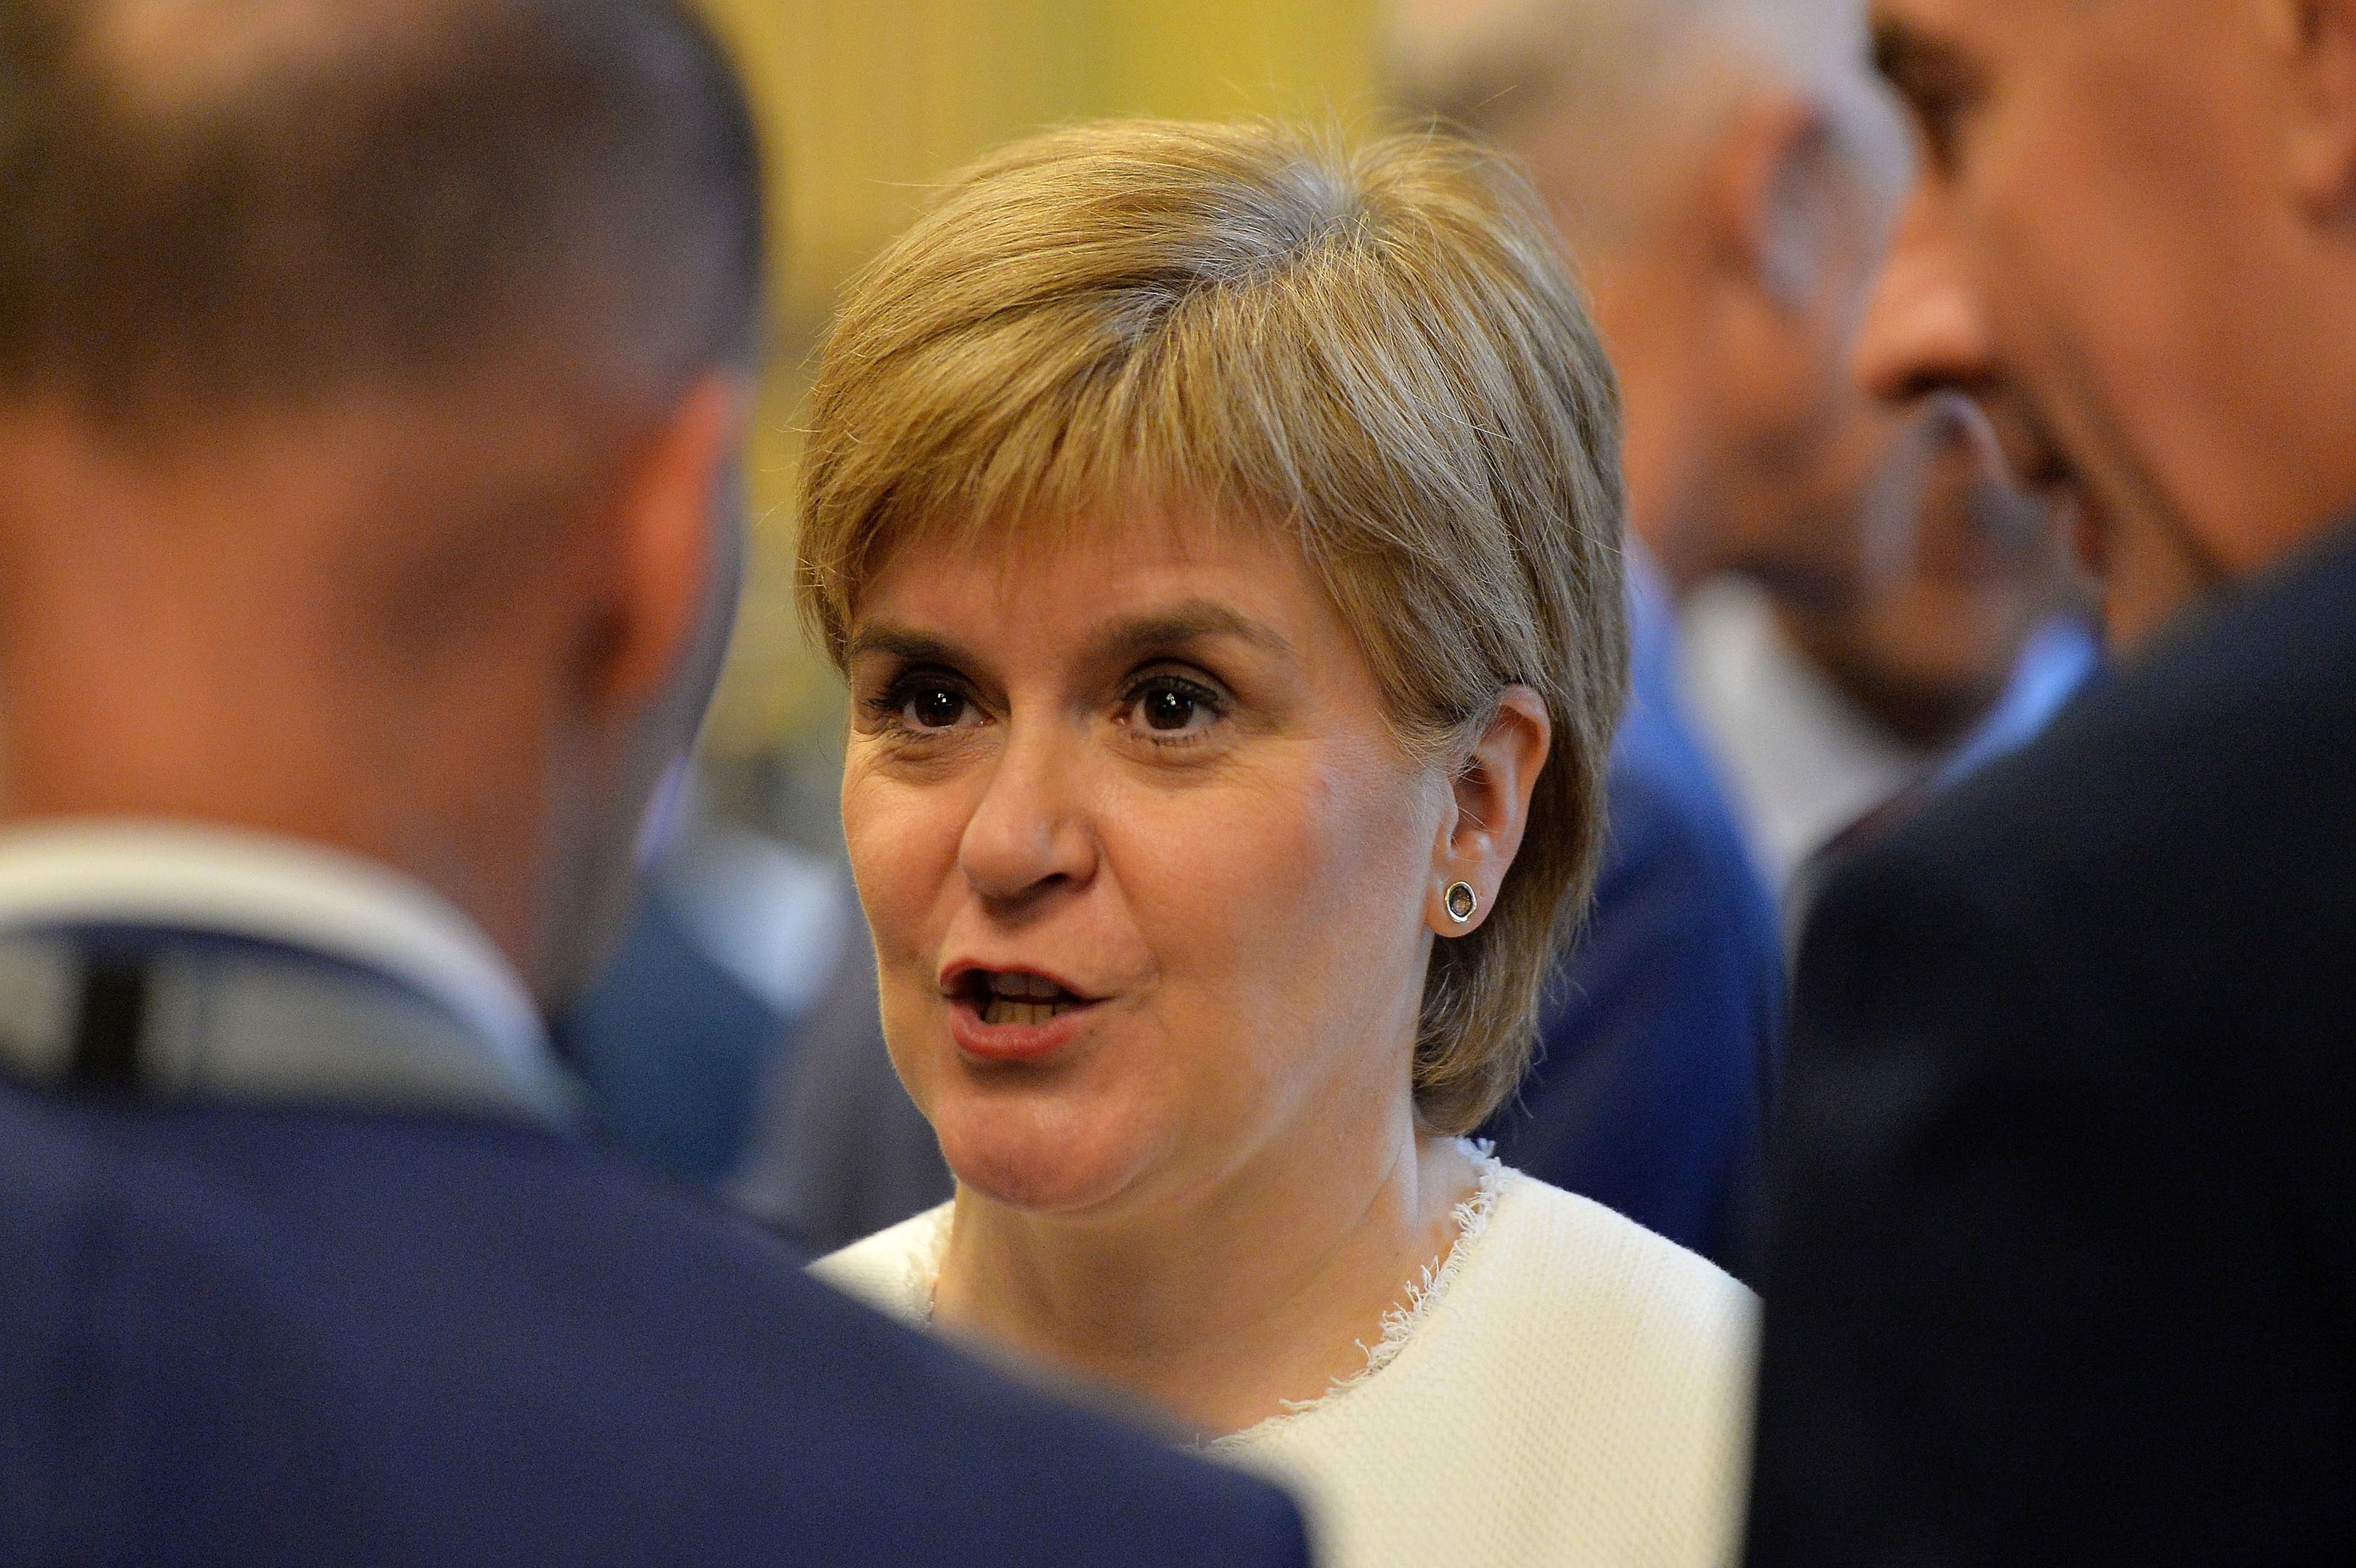 Nicola Sturgeon (Mark Runnacles/Getty Images)